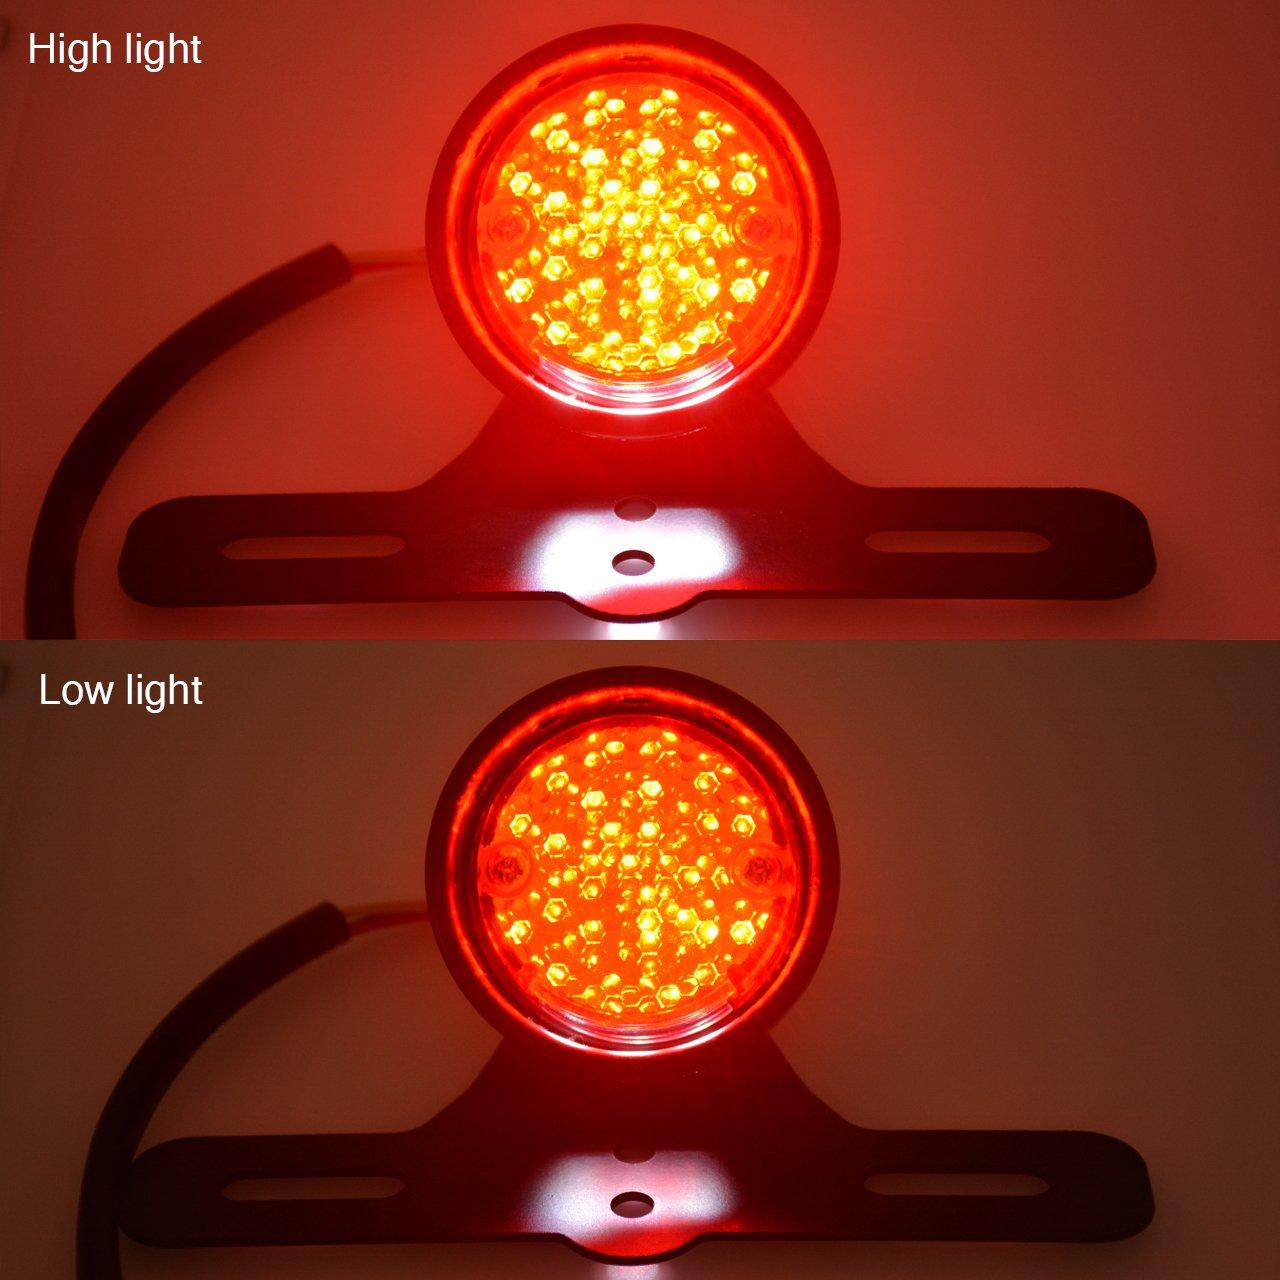 TUINCYN Motorcycle Integrated LED Tail Light with License Plate Holder Bike Retro Taillight LED Rear Stop Lamp Running Light for Harley-Davidson Harley Bobber Chopper Racer Cruiser